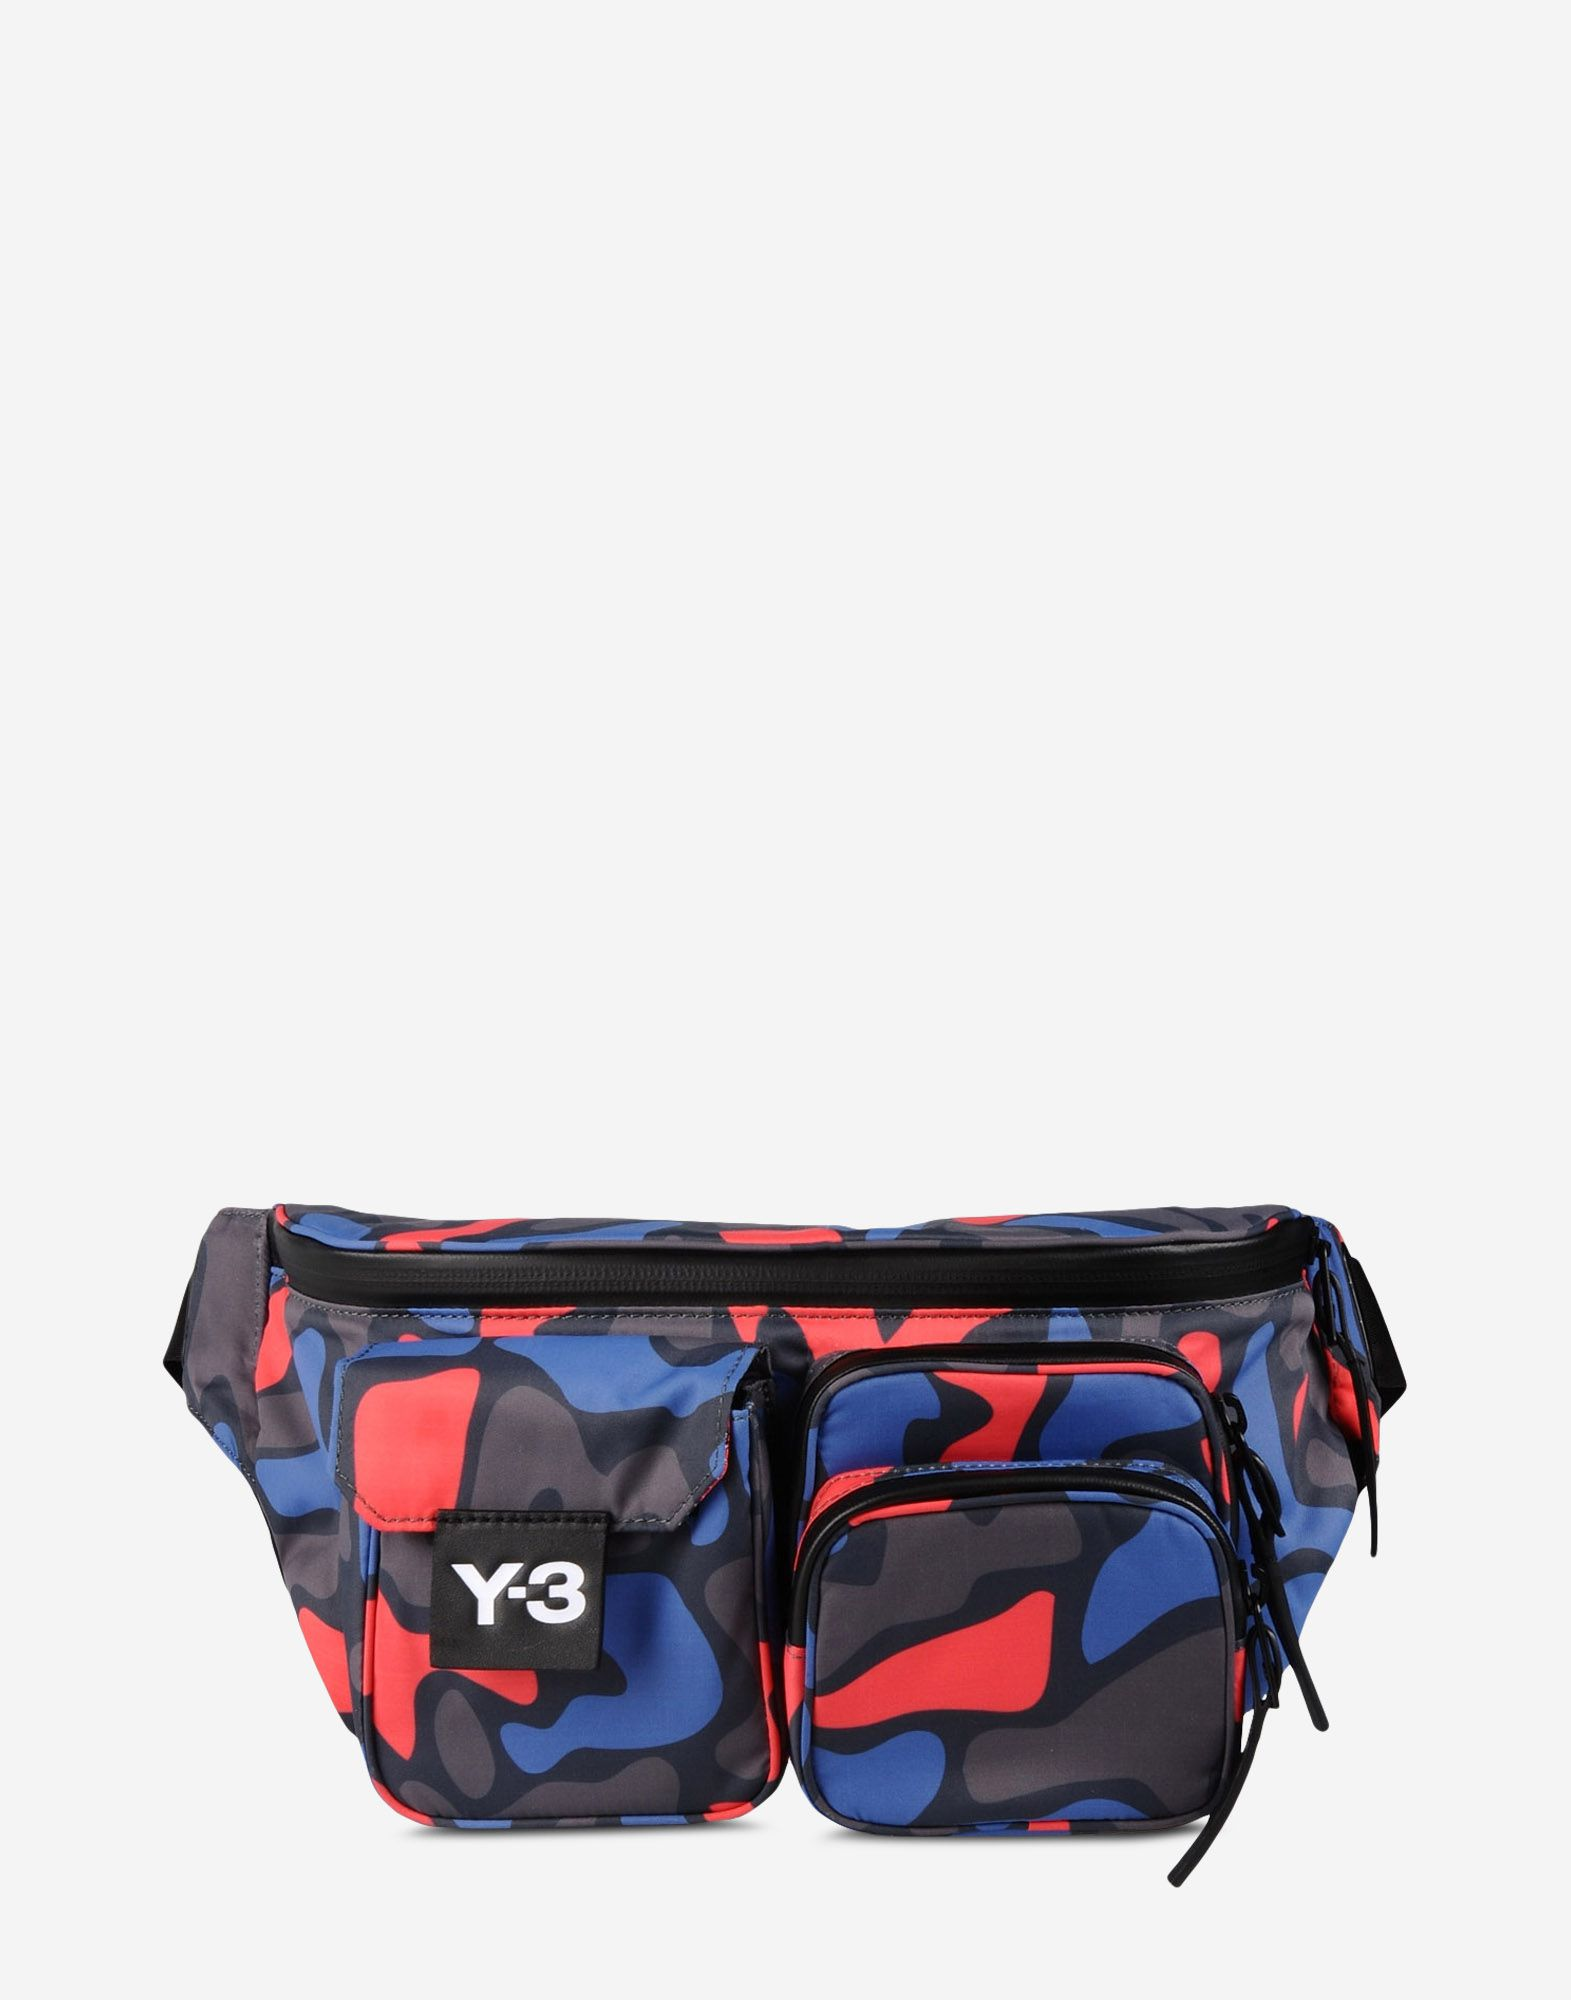 Adidas 3 Bag Bananes Fs Officiel Site Waist Y 6TqwXz1A1